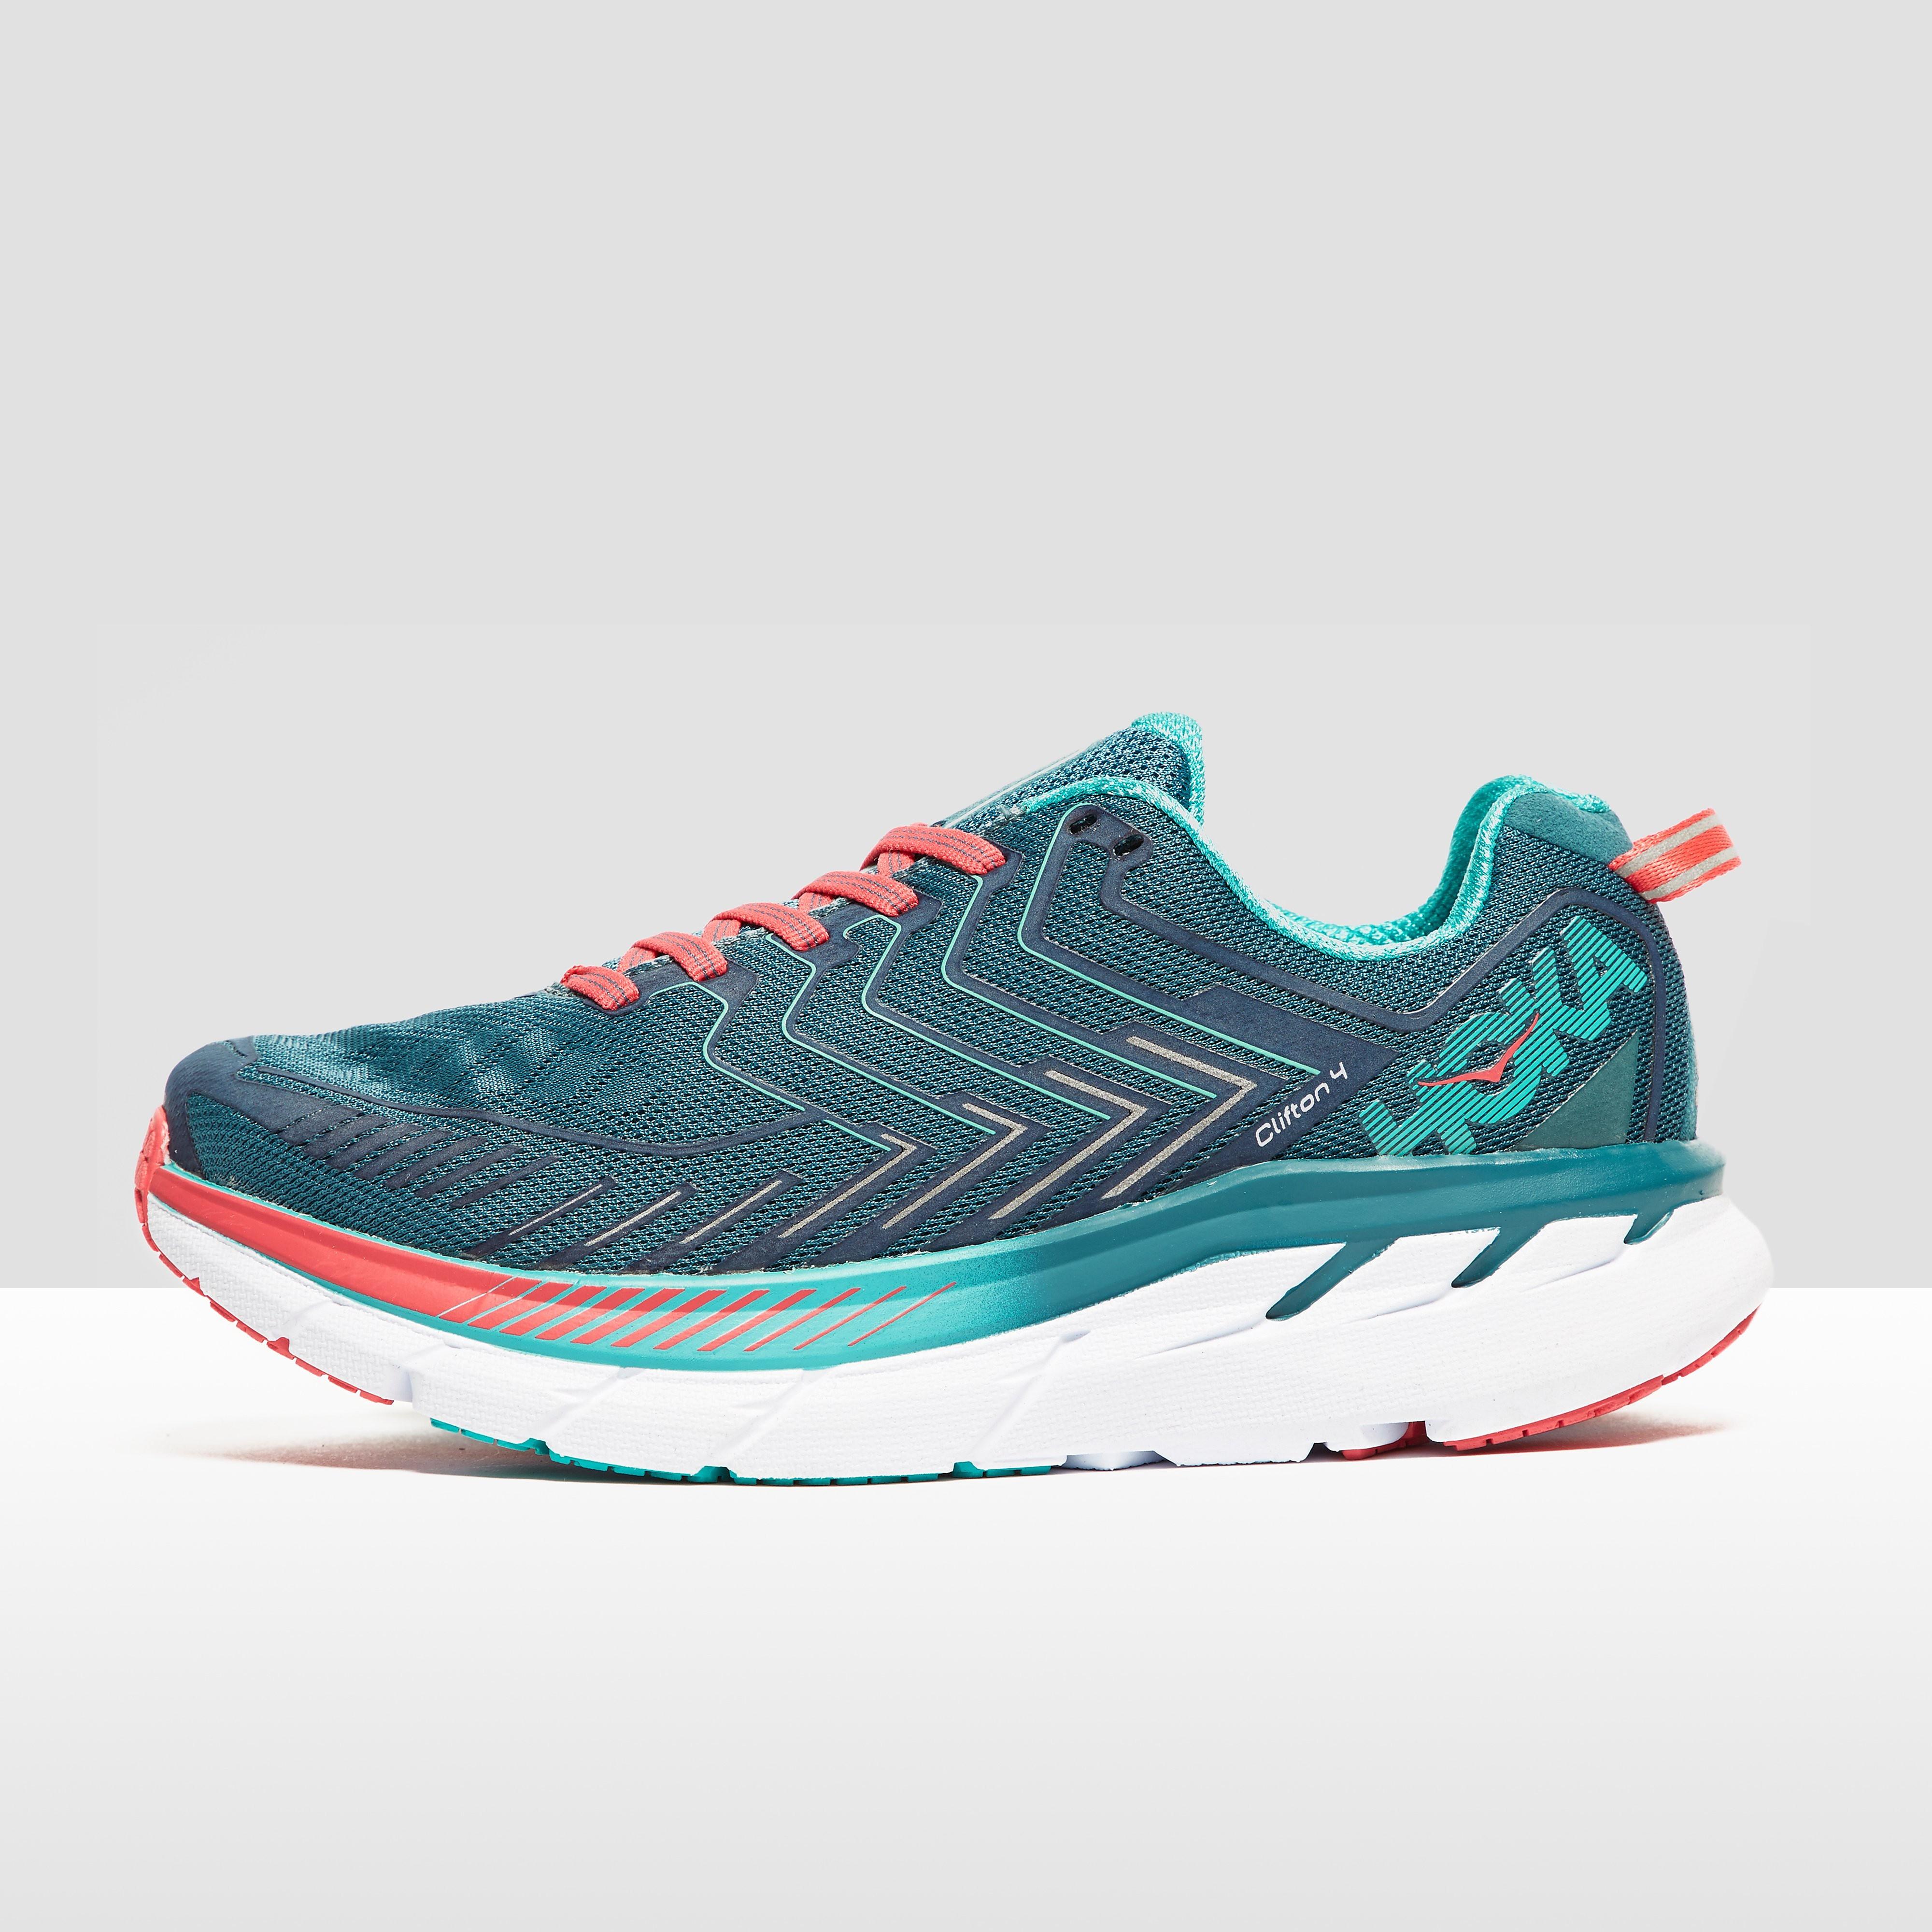 Hoka One One Women's Clifton 4 Running Shoes